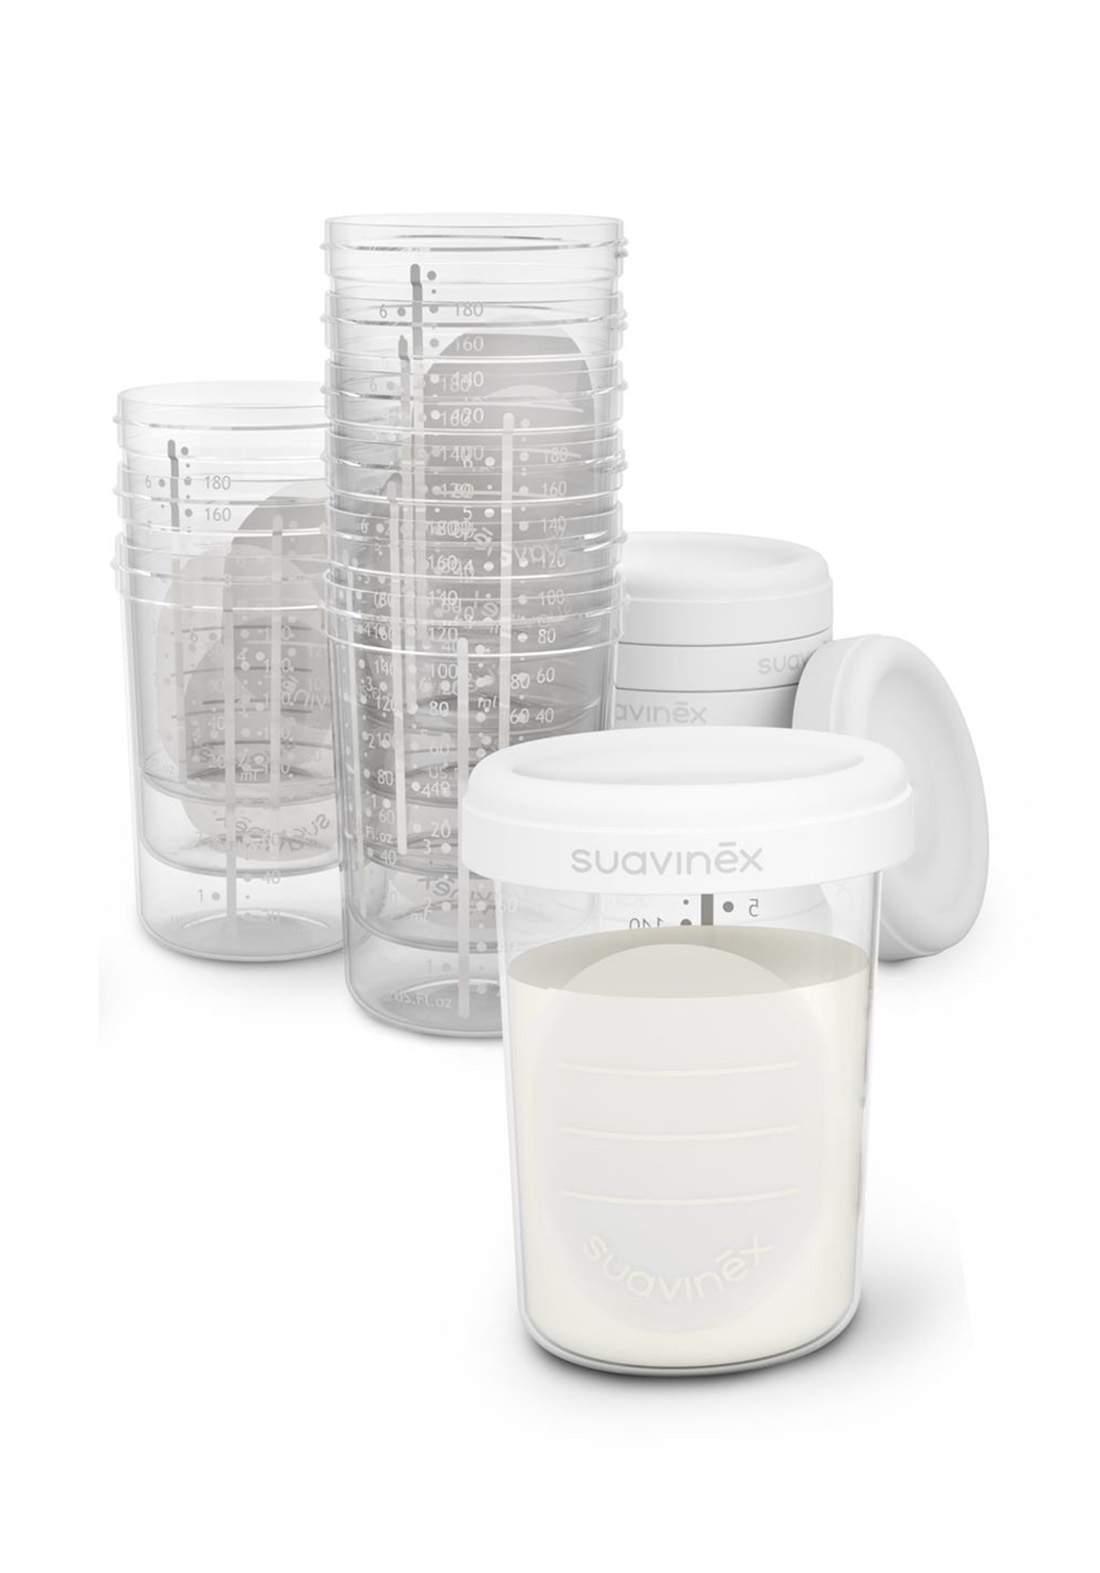 Suavinex Storage Containers علب تخزين الحليب 10 قطع